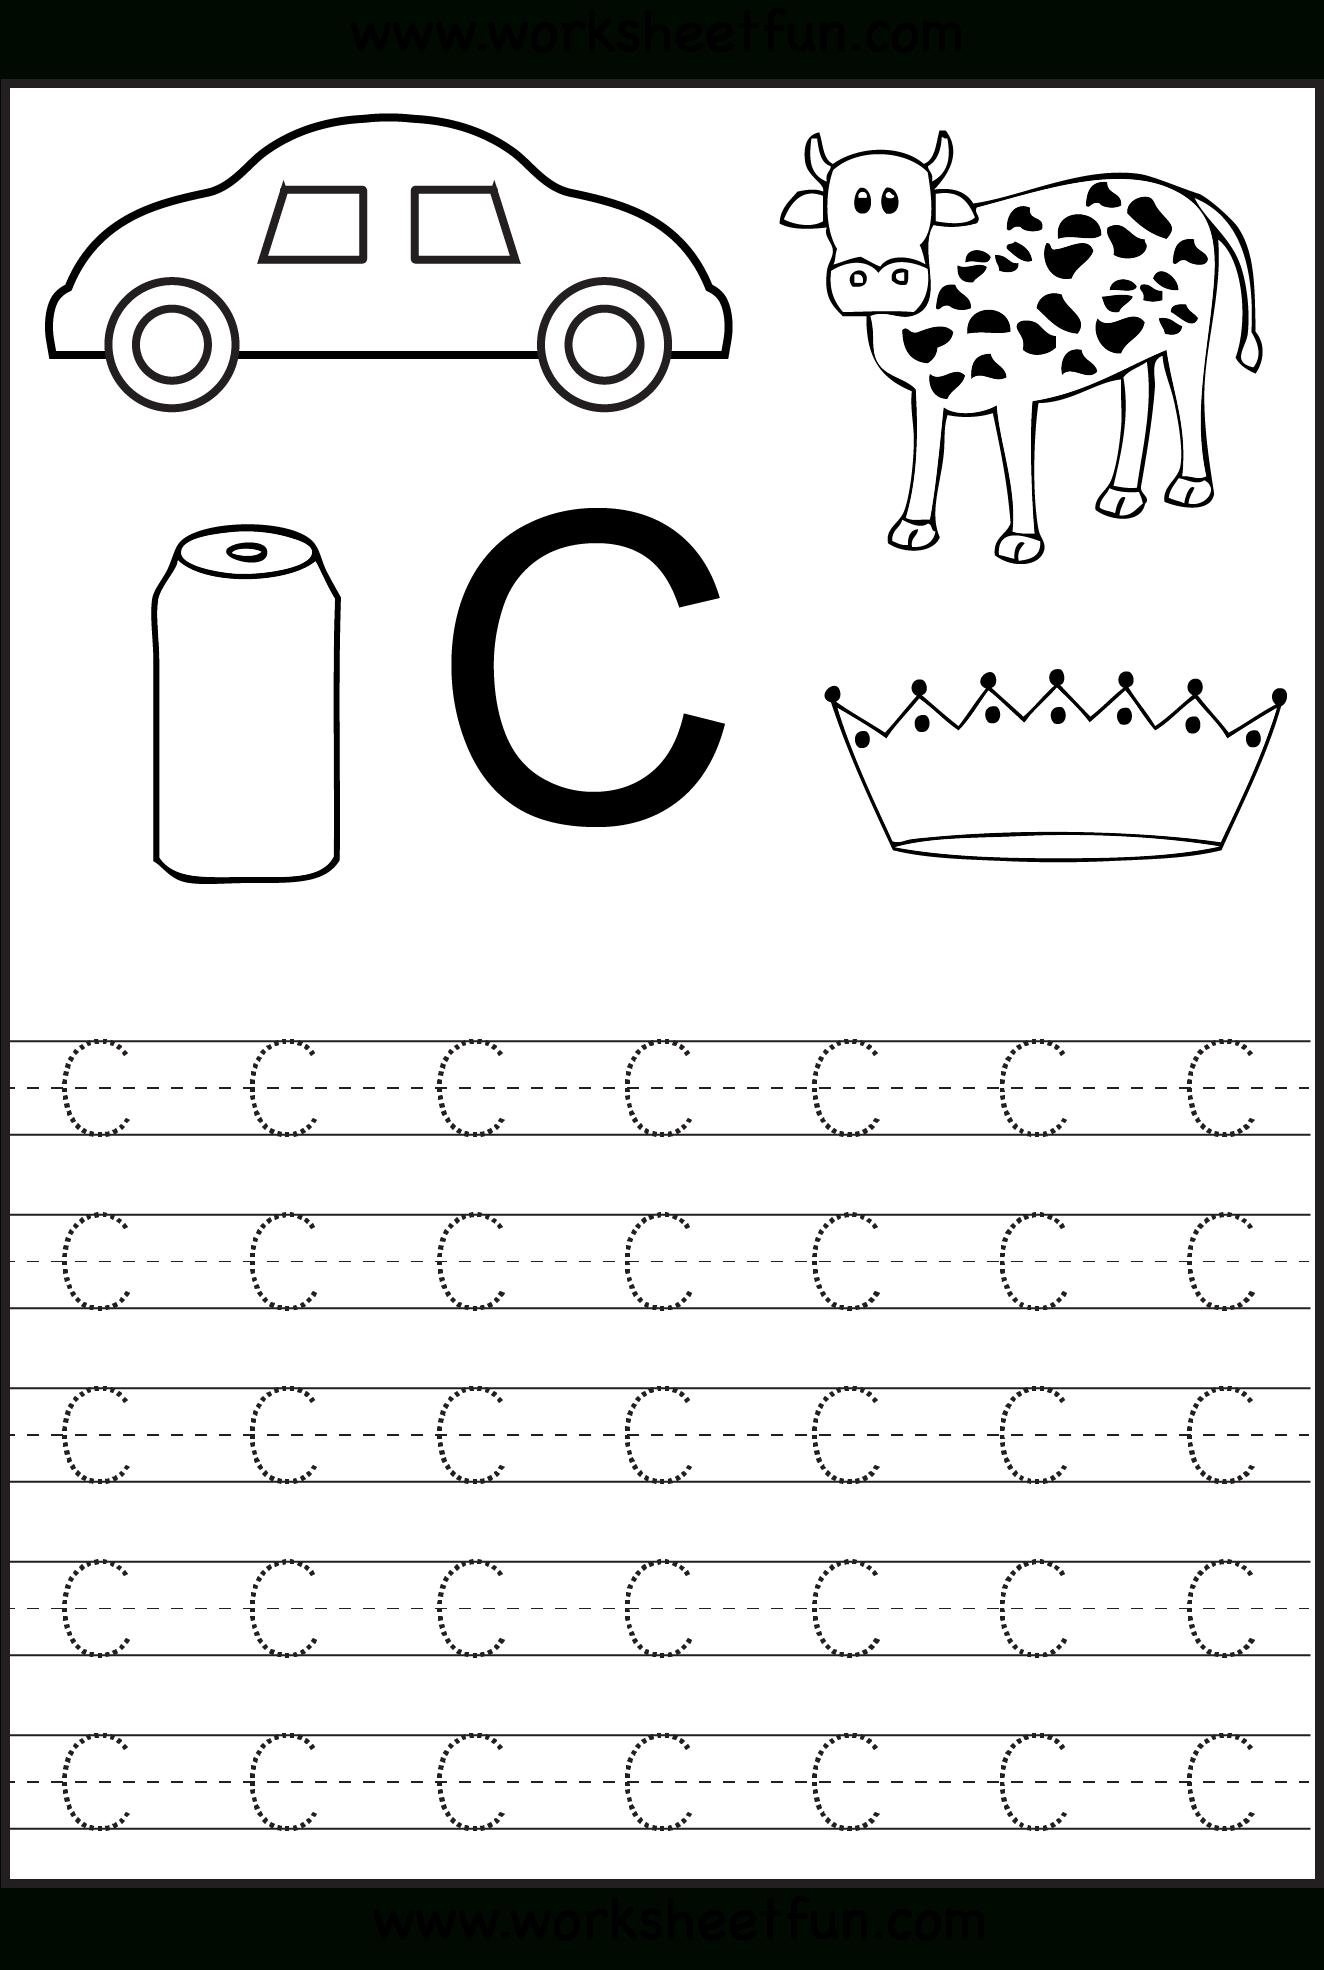 Learning The Letter C | Worksheet | Education regarding Letter C Worksheets For Toddlers